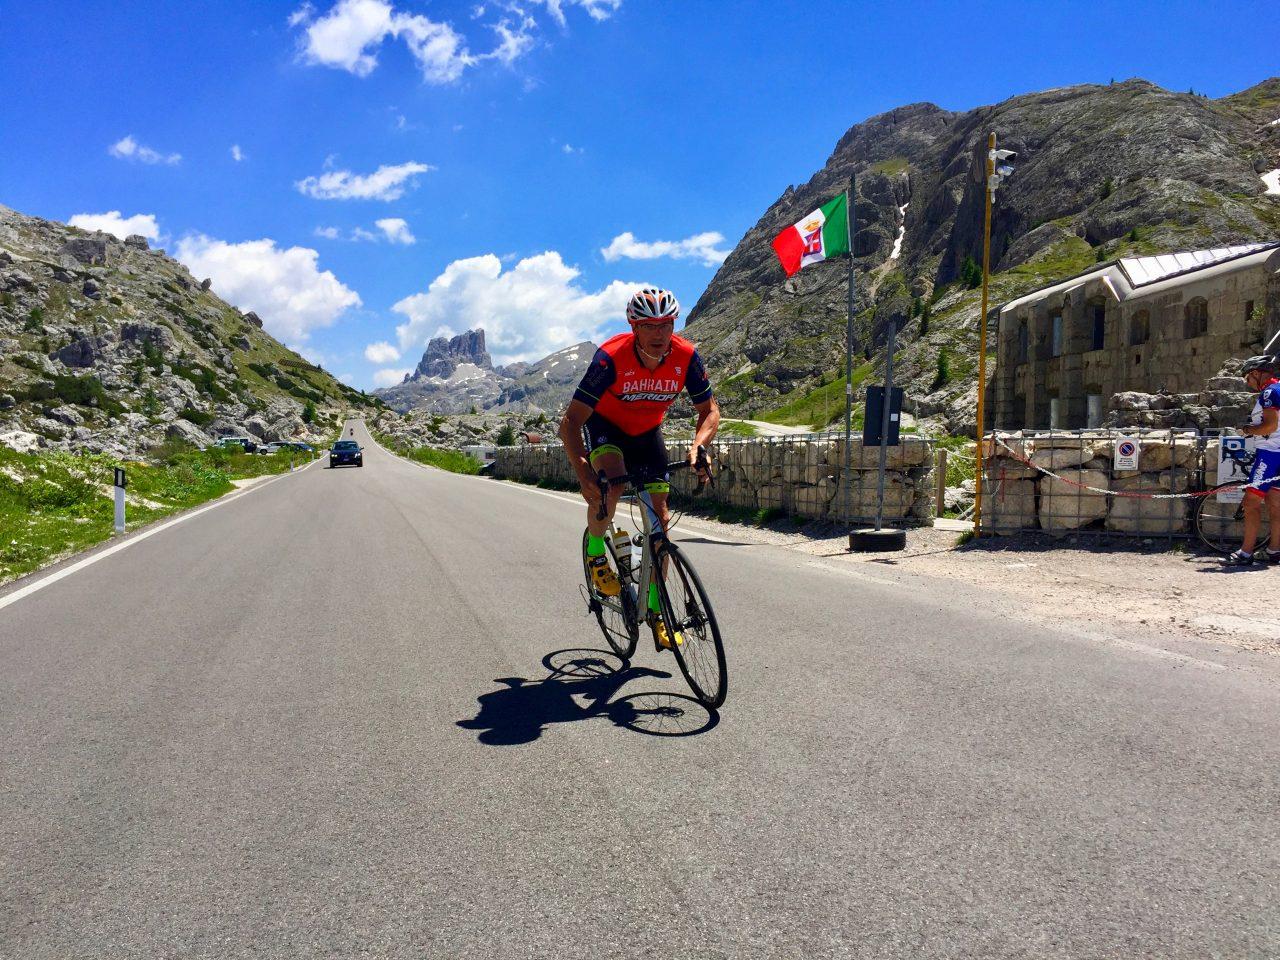 Passo Valparola, Dolomites, Italy